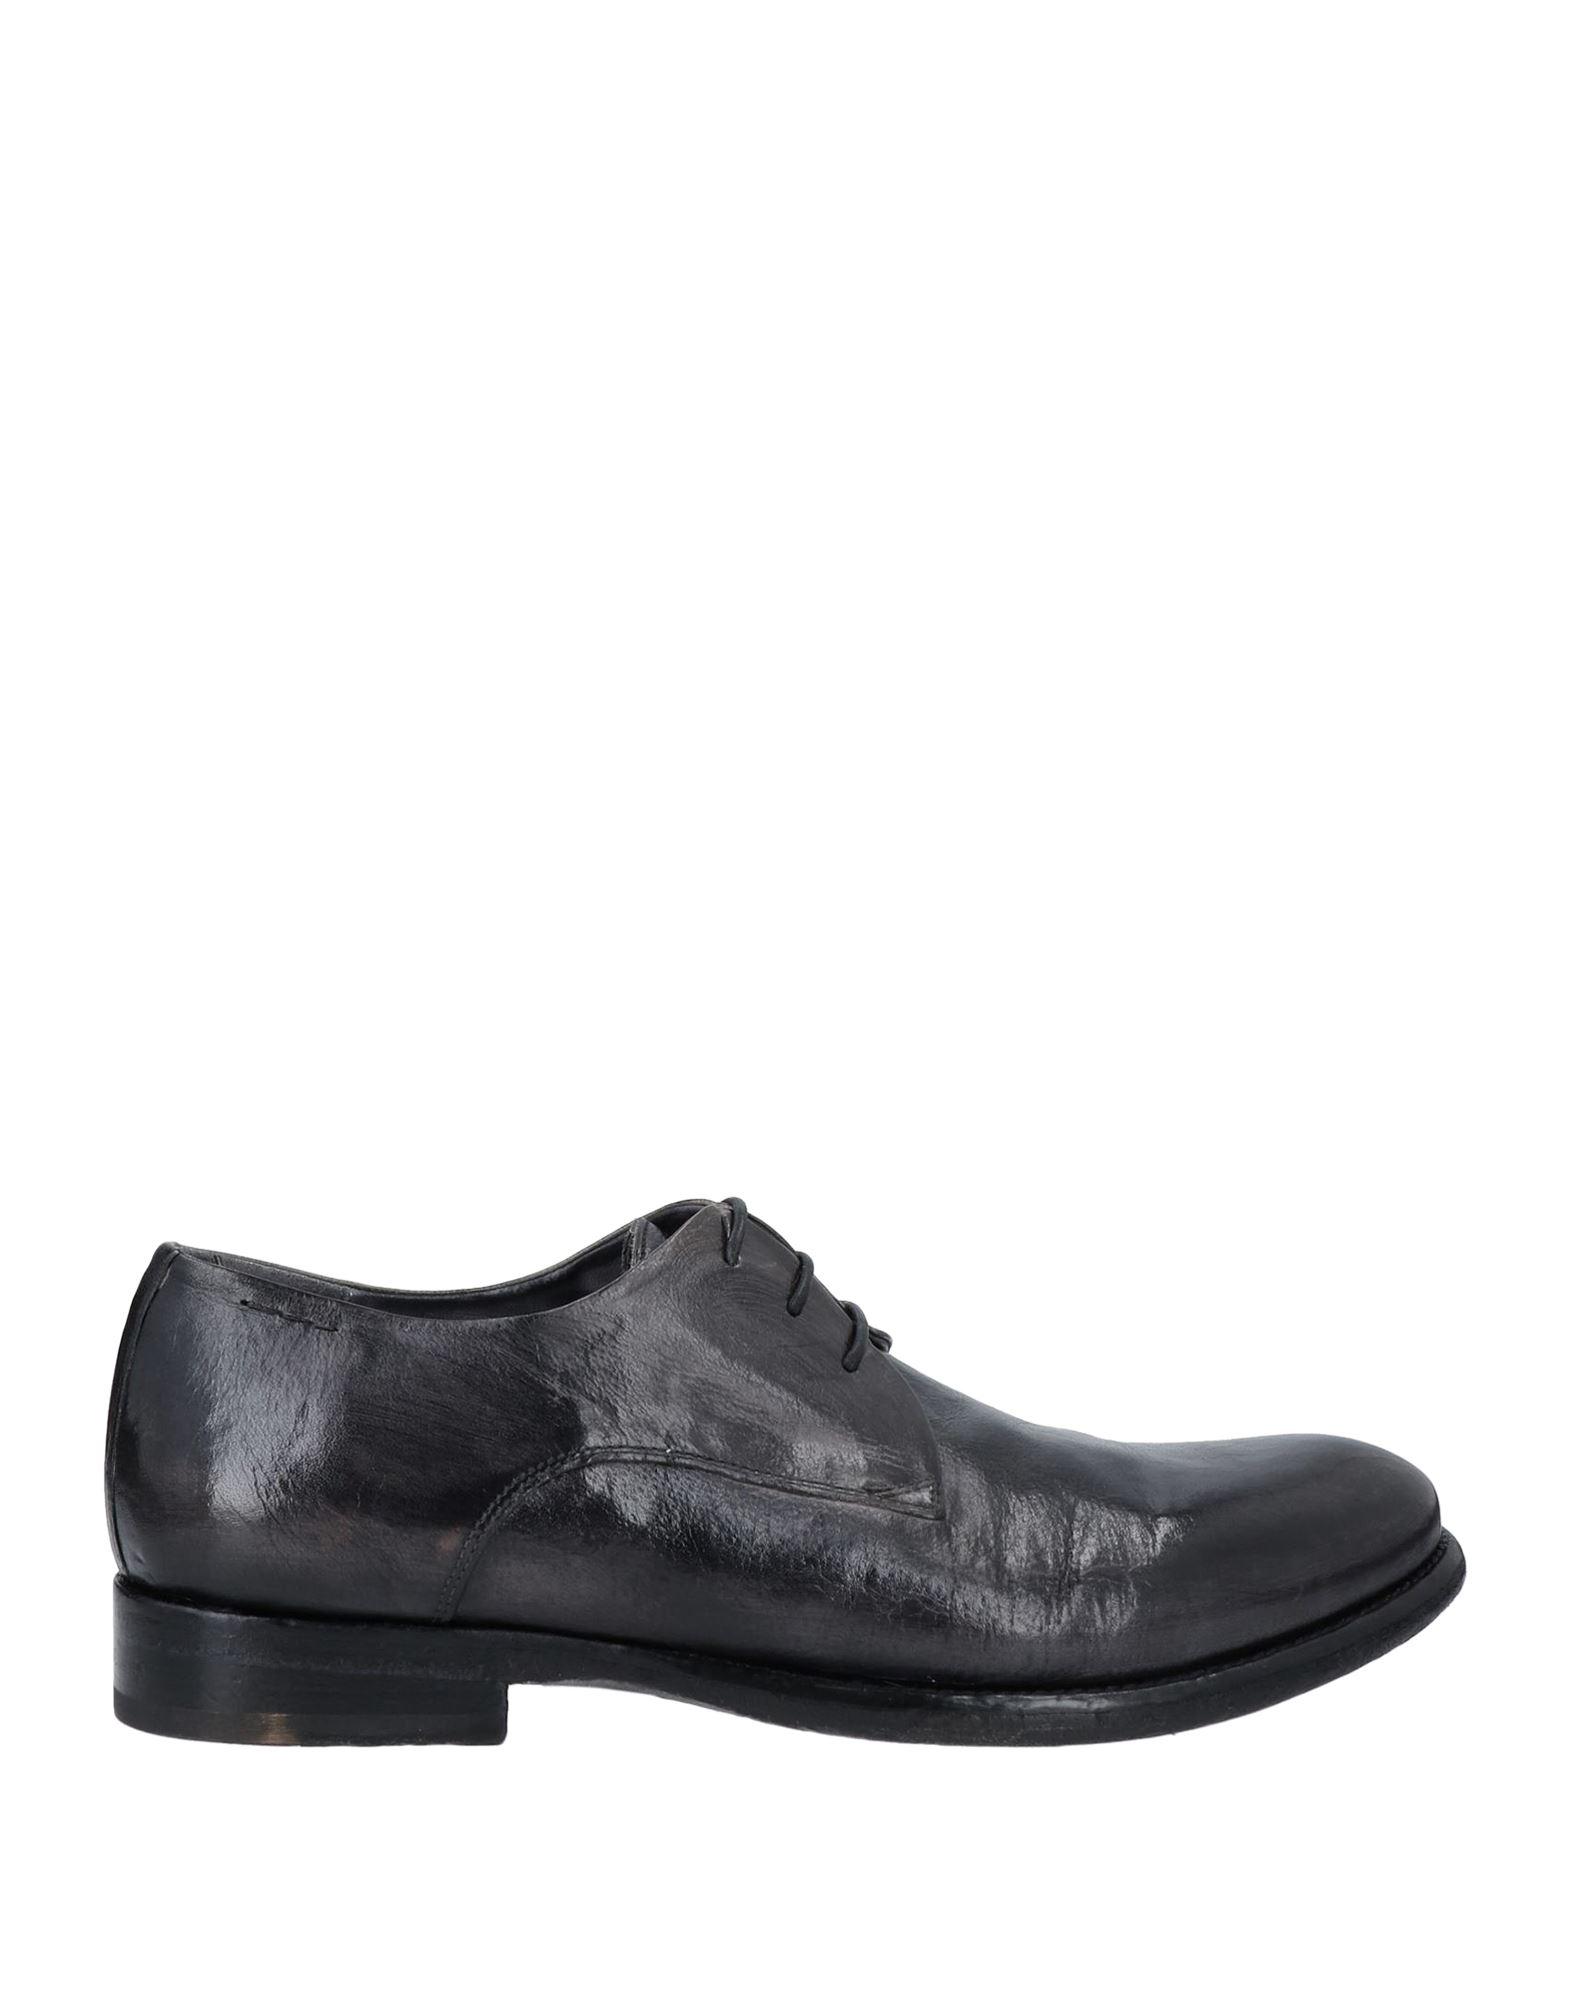 ALEXANDER HOTTO Обувь на шнурках фото